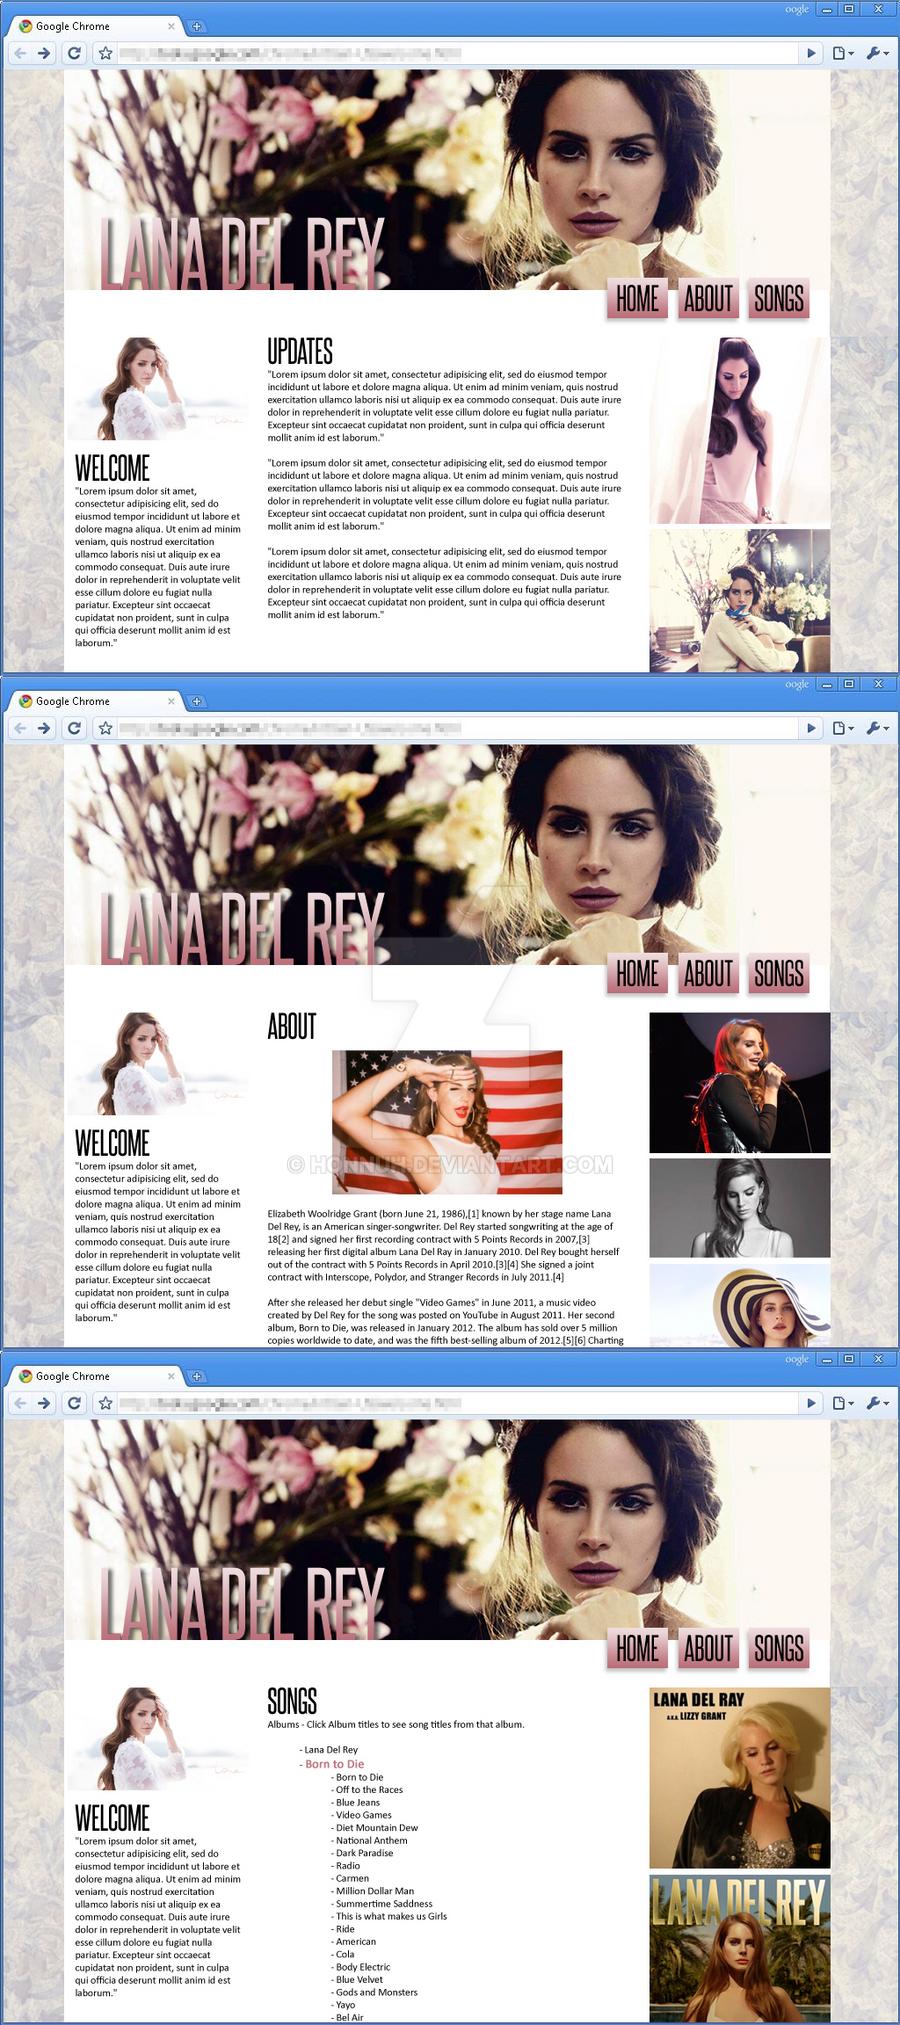 Lana Del Rey web design by HONNUH